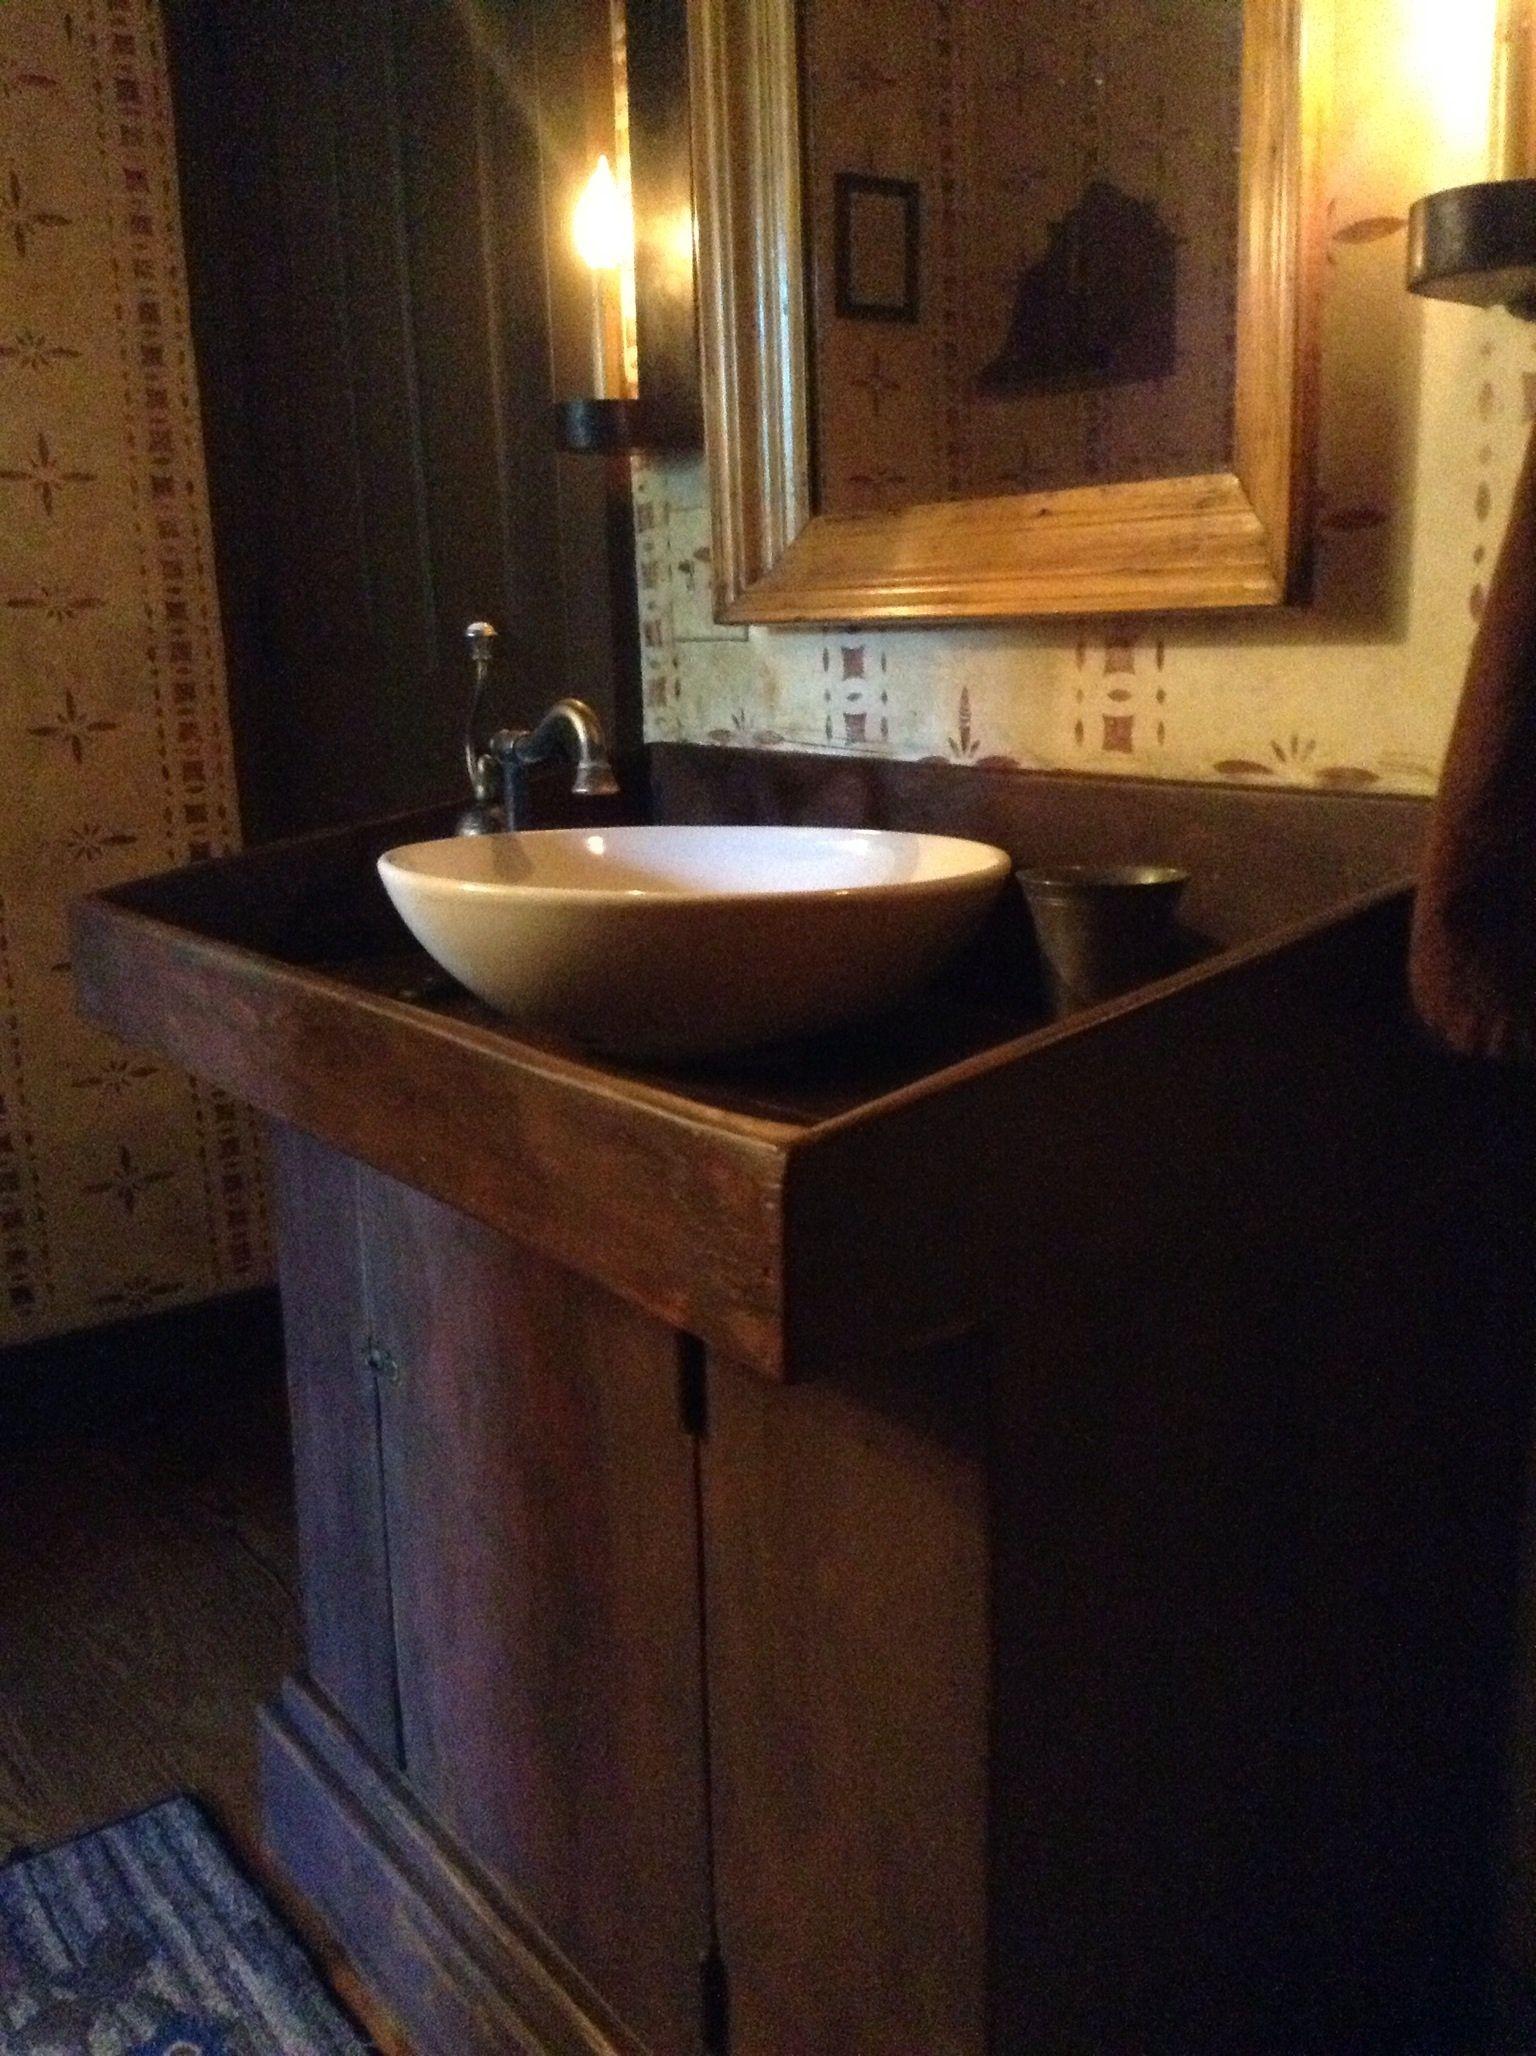 Dry Sink Turned Into A Beautiful Bathroom Vanity Primitive Bathroom Decor Primitive Country Bathrooms Primitive Bathrooms